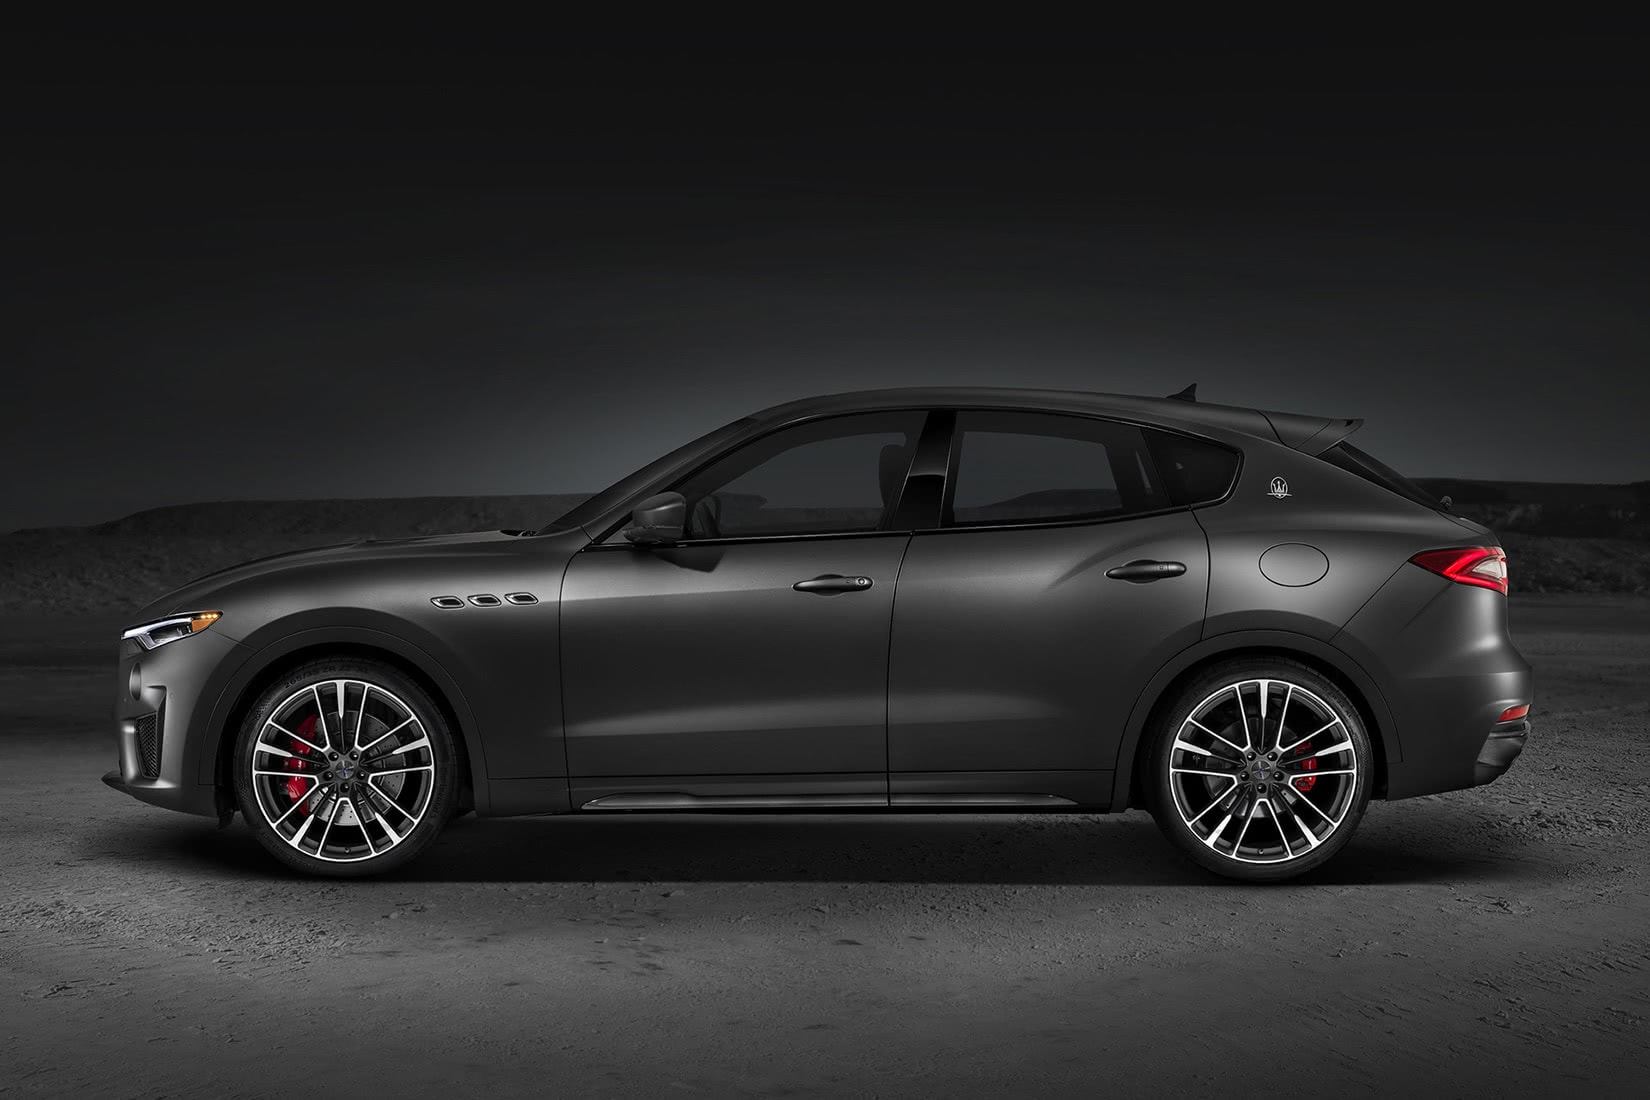 best luxury suv 2021 Maserati Levante Trofeo - Luxe Digital